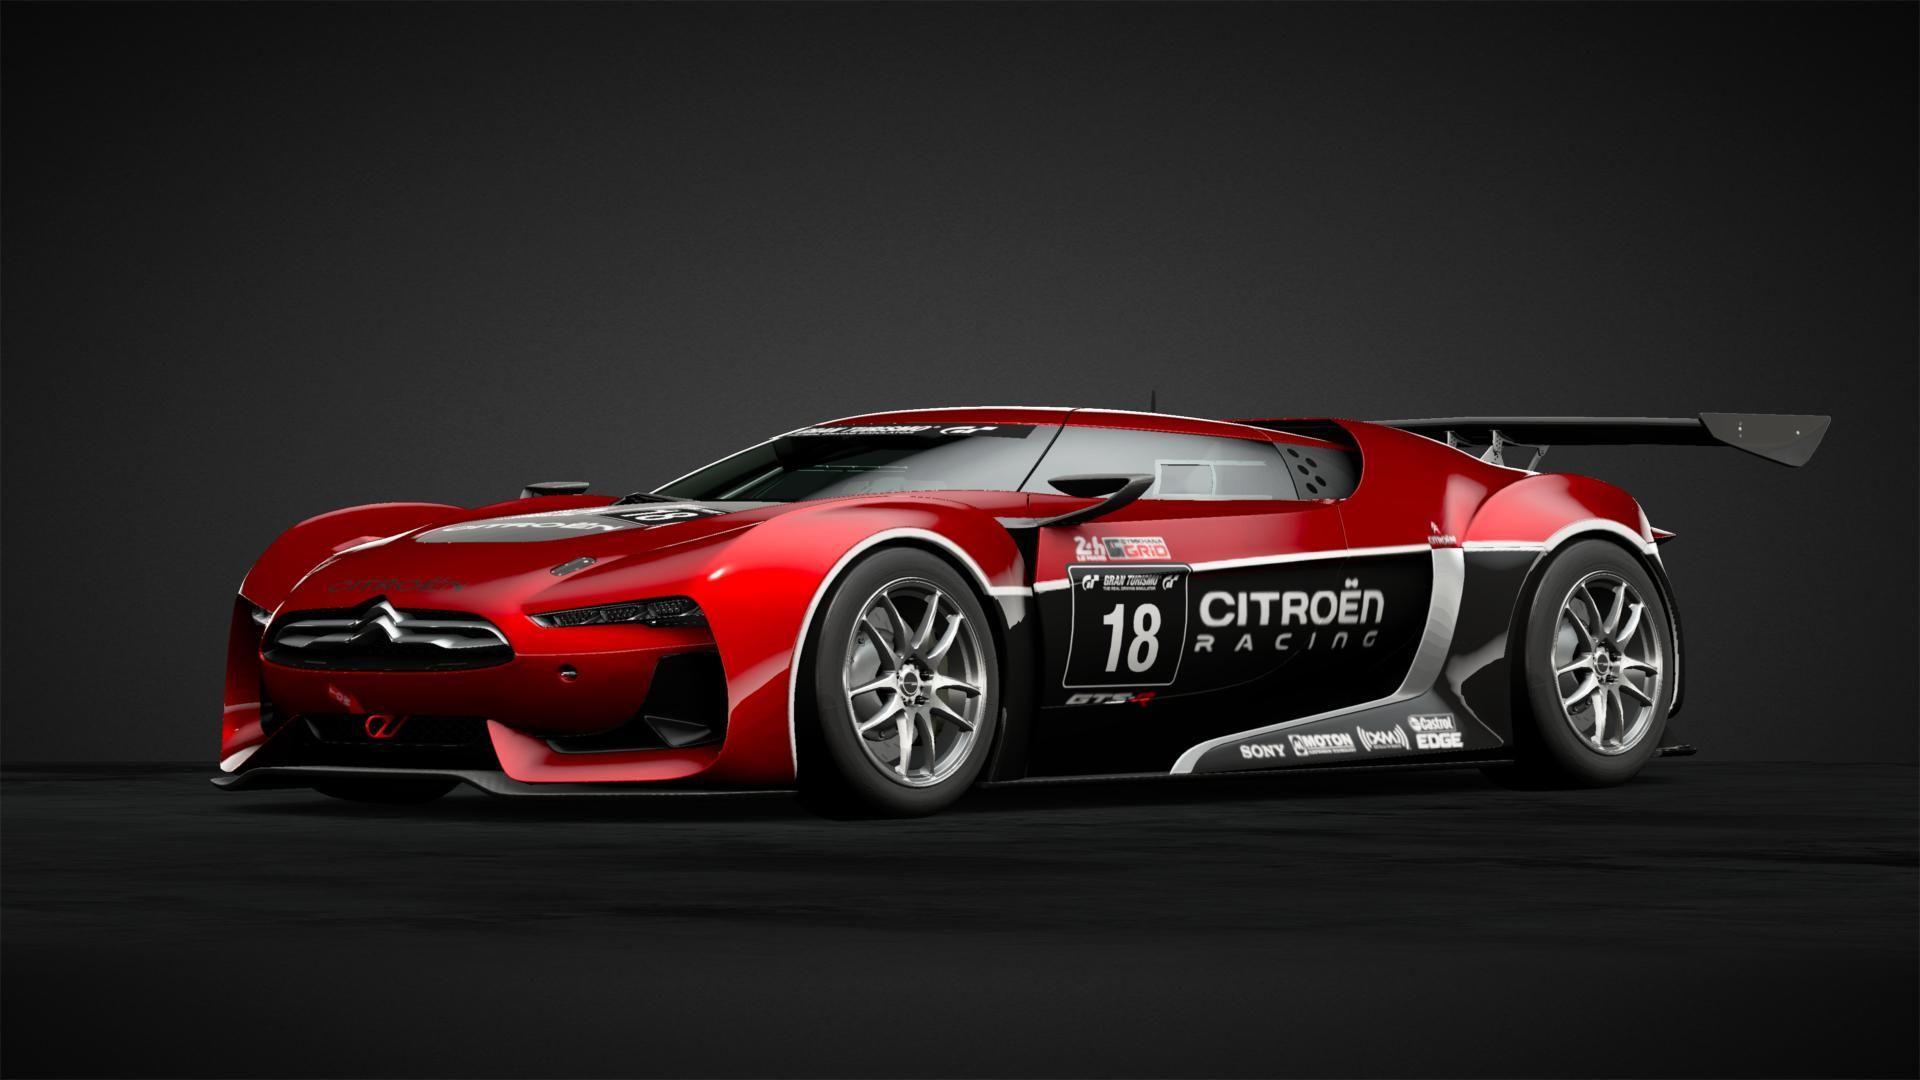 Citroen group 4 LeMans ver. 1.3 Car Livery by